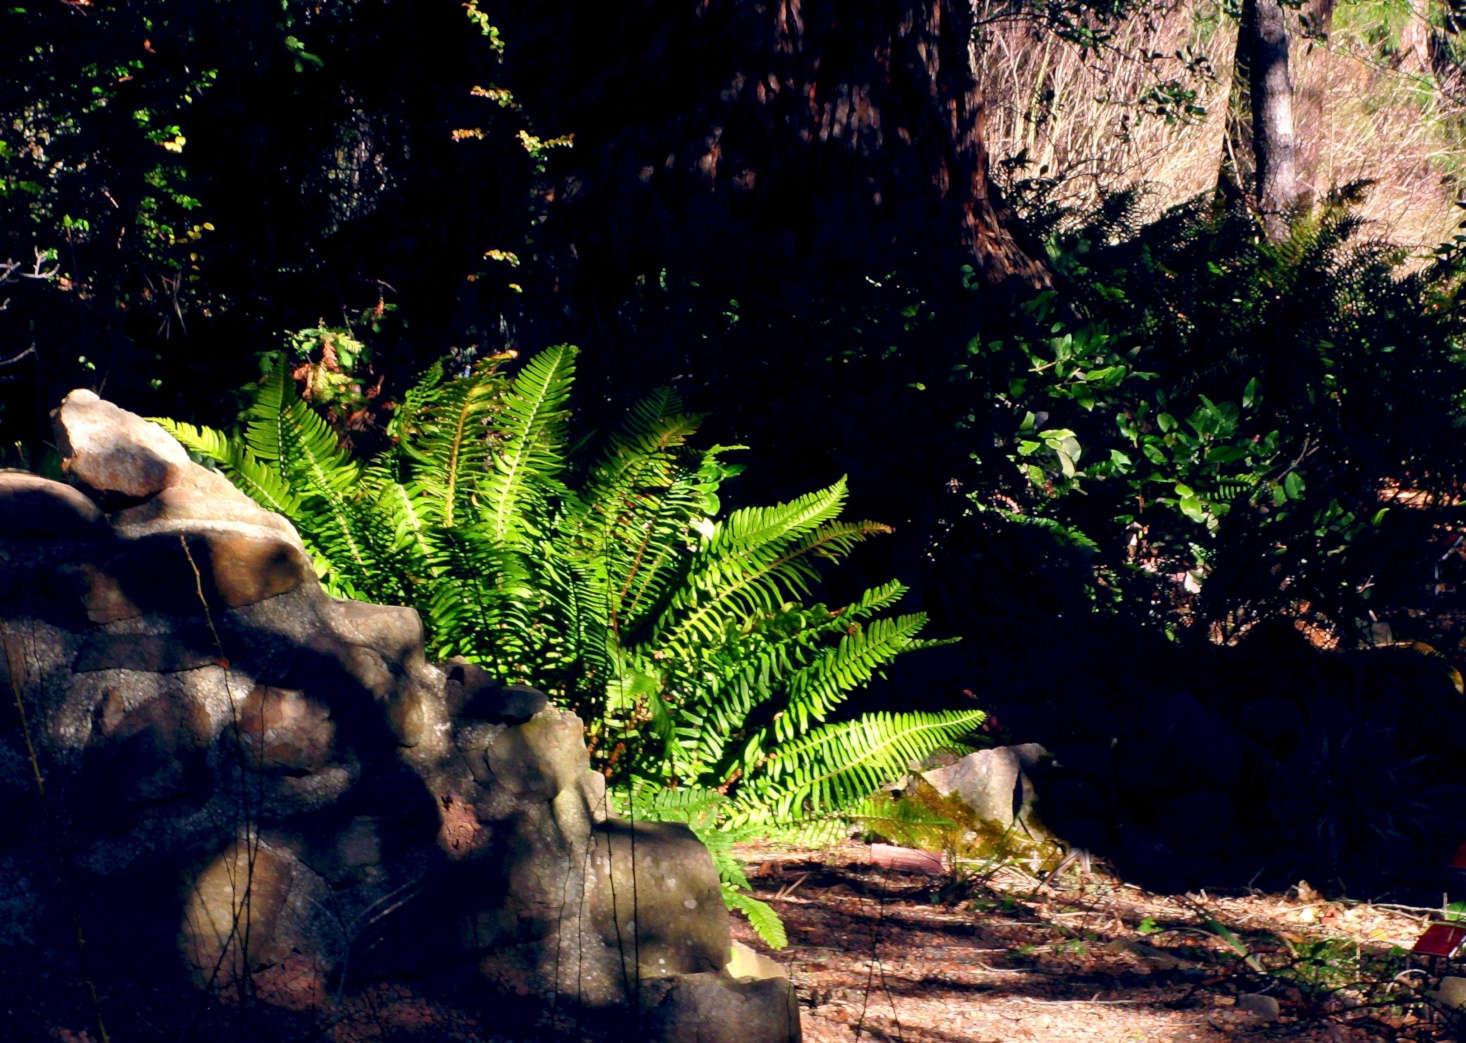 Western sword fern grows beside a trail in Tilden Park near Berkeley, California. Photograph by John Rusk via Flickr.